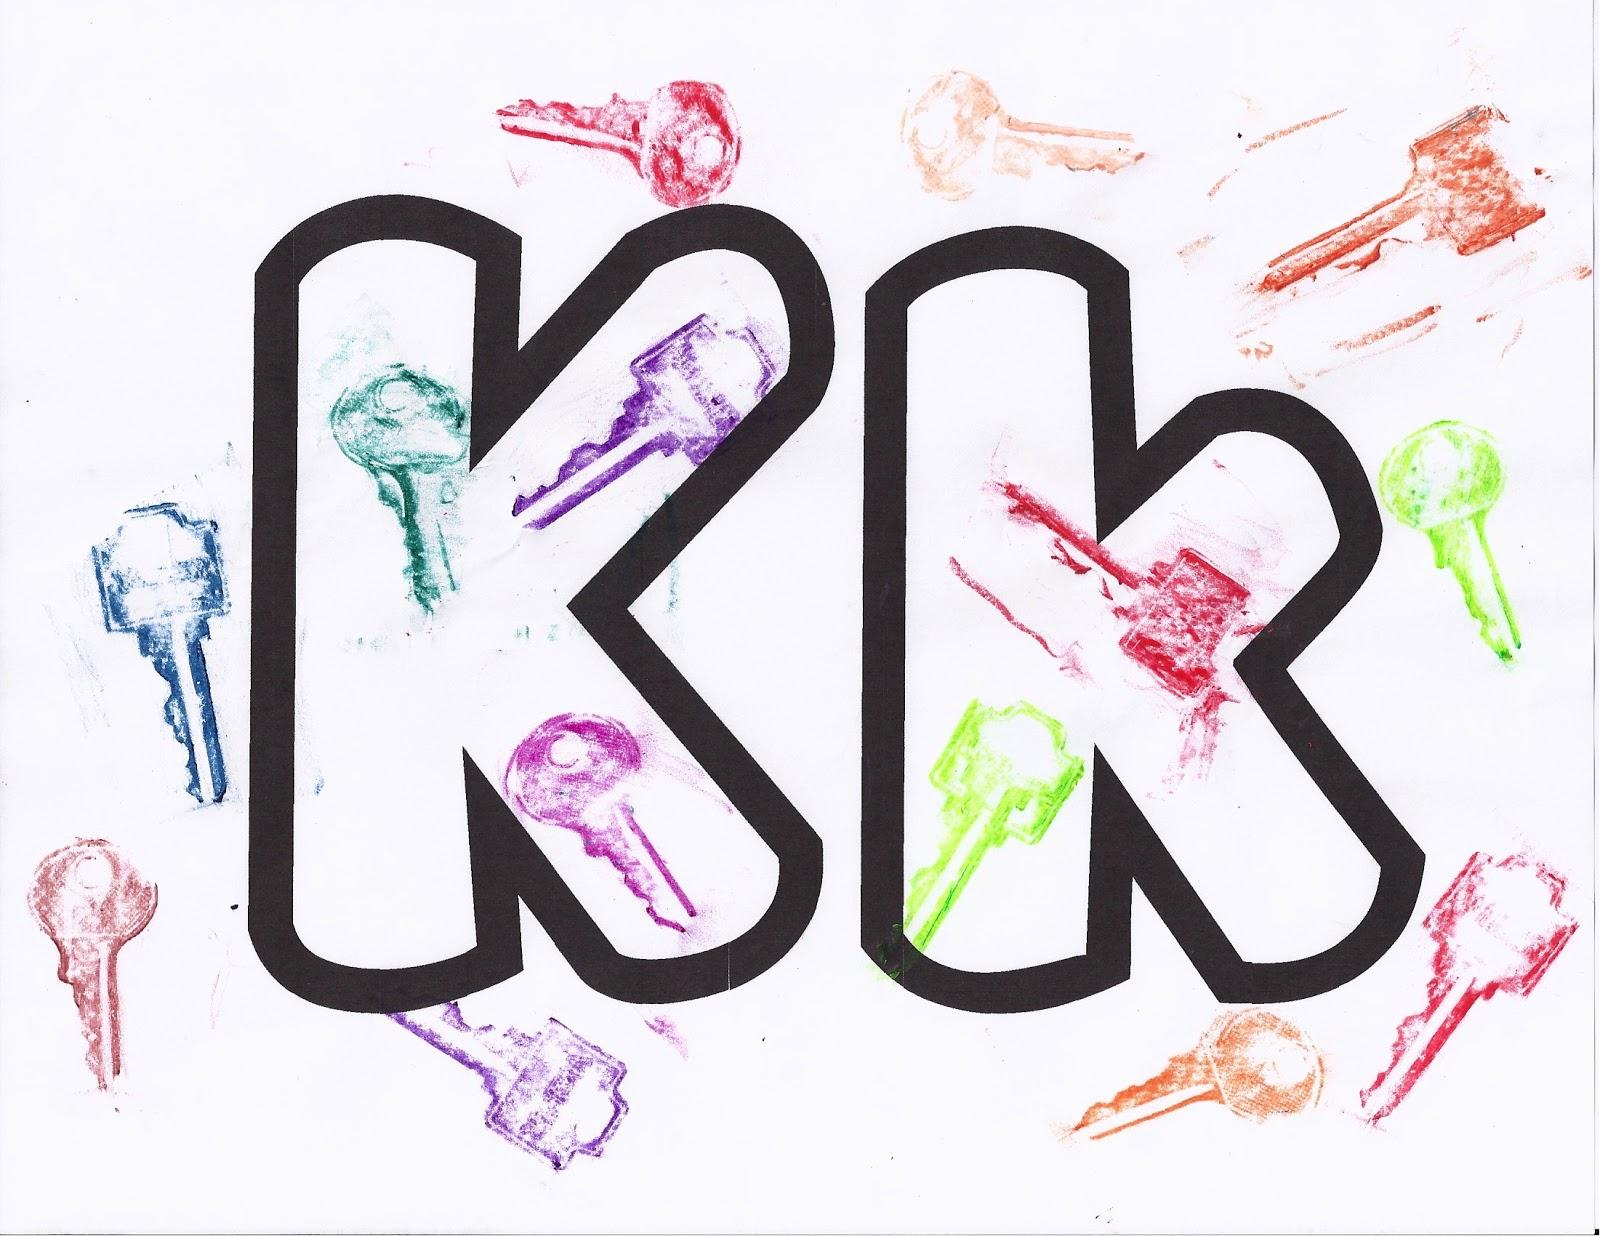 Puddle Wonderful Learning Preschool Activities Letter Of The Week Kk